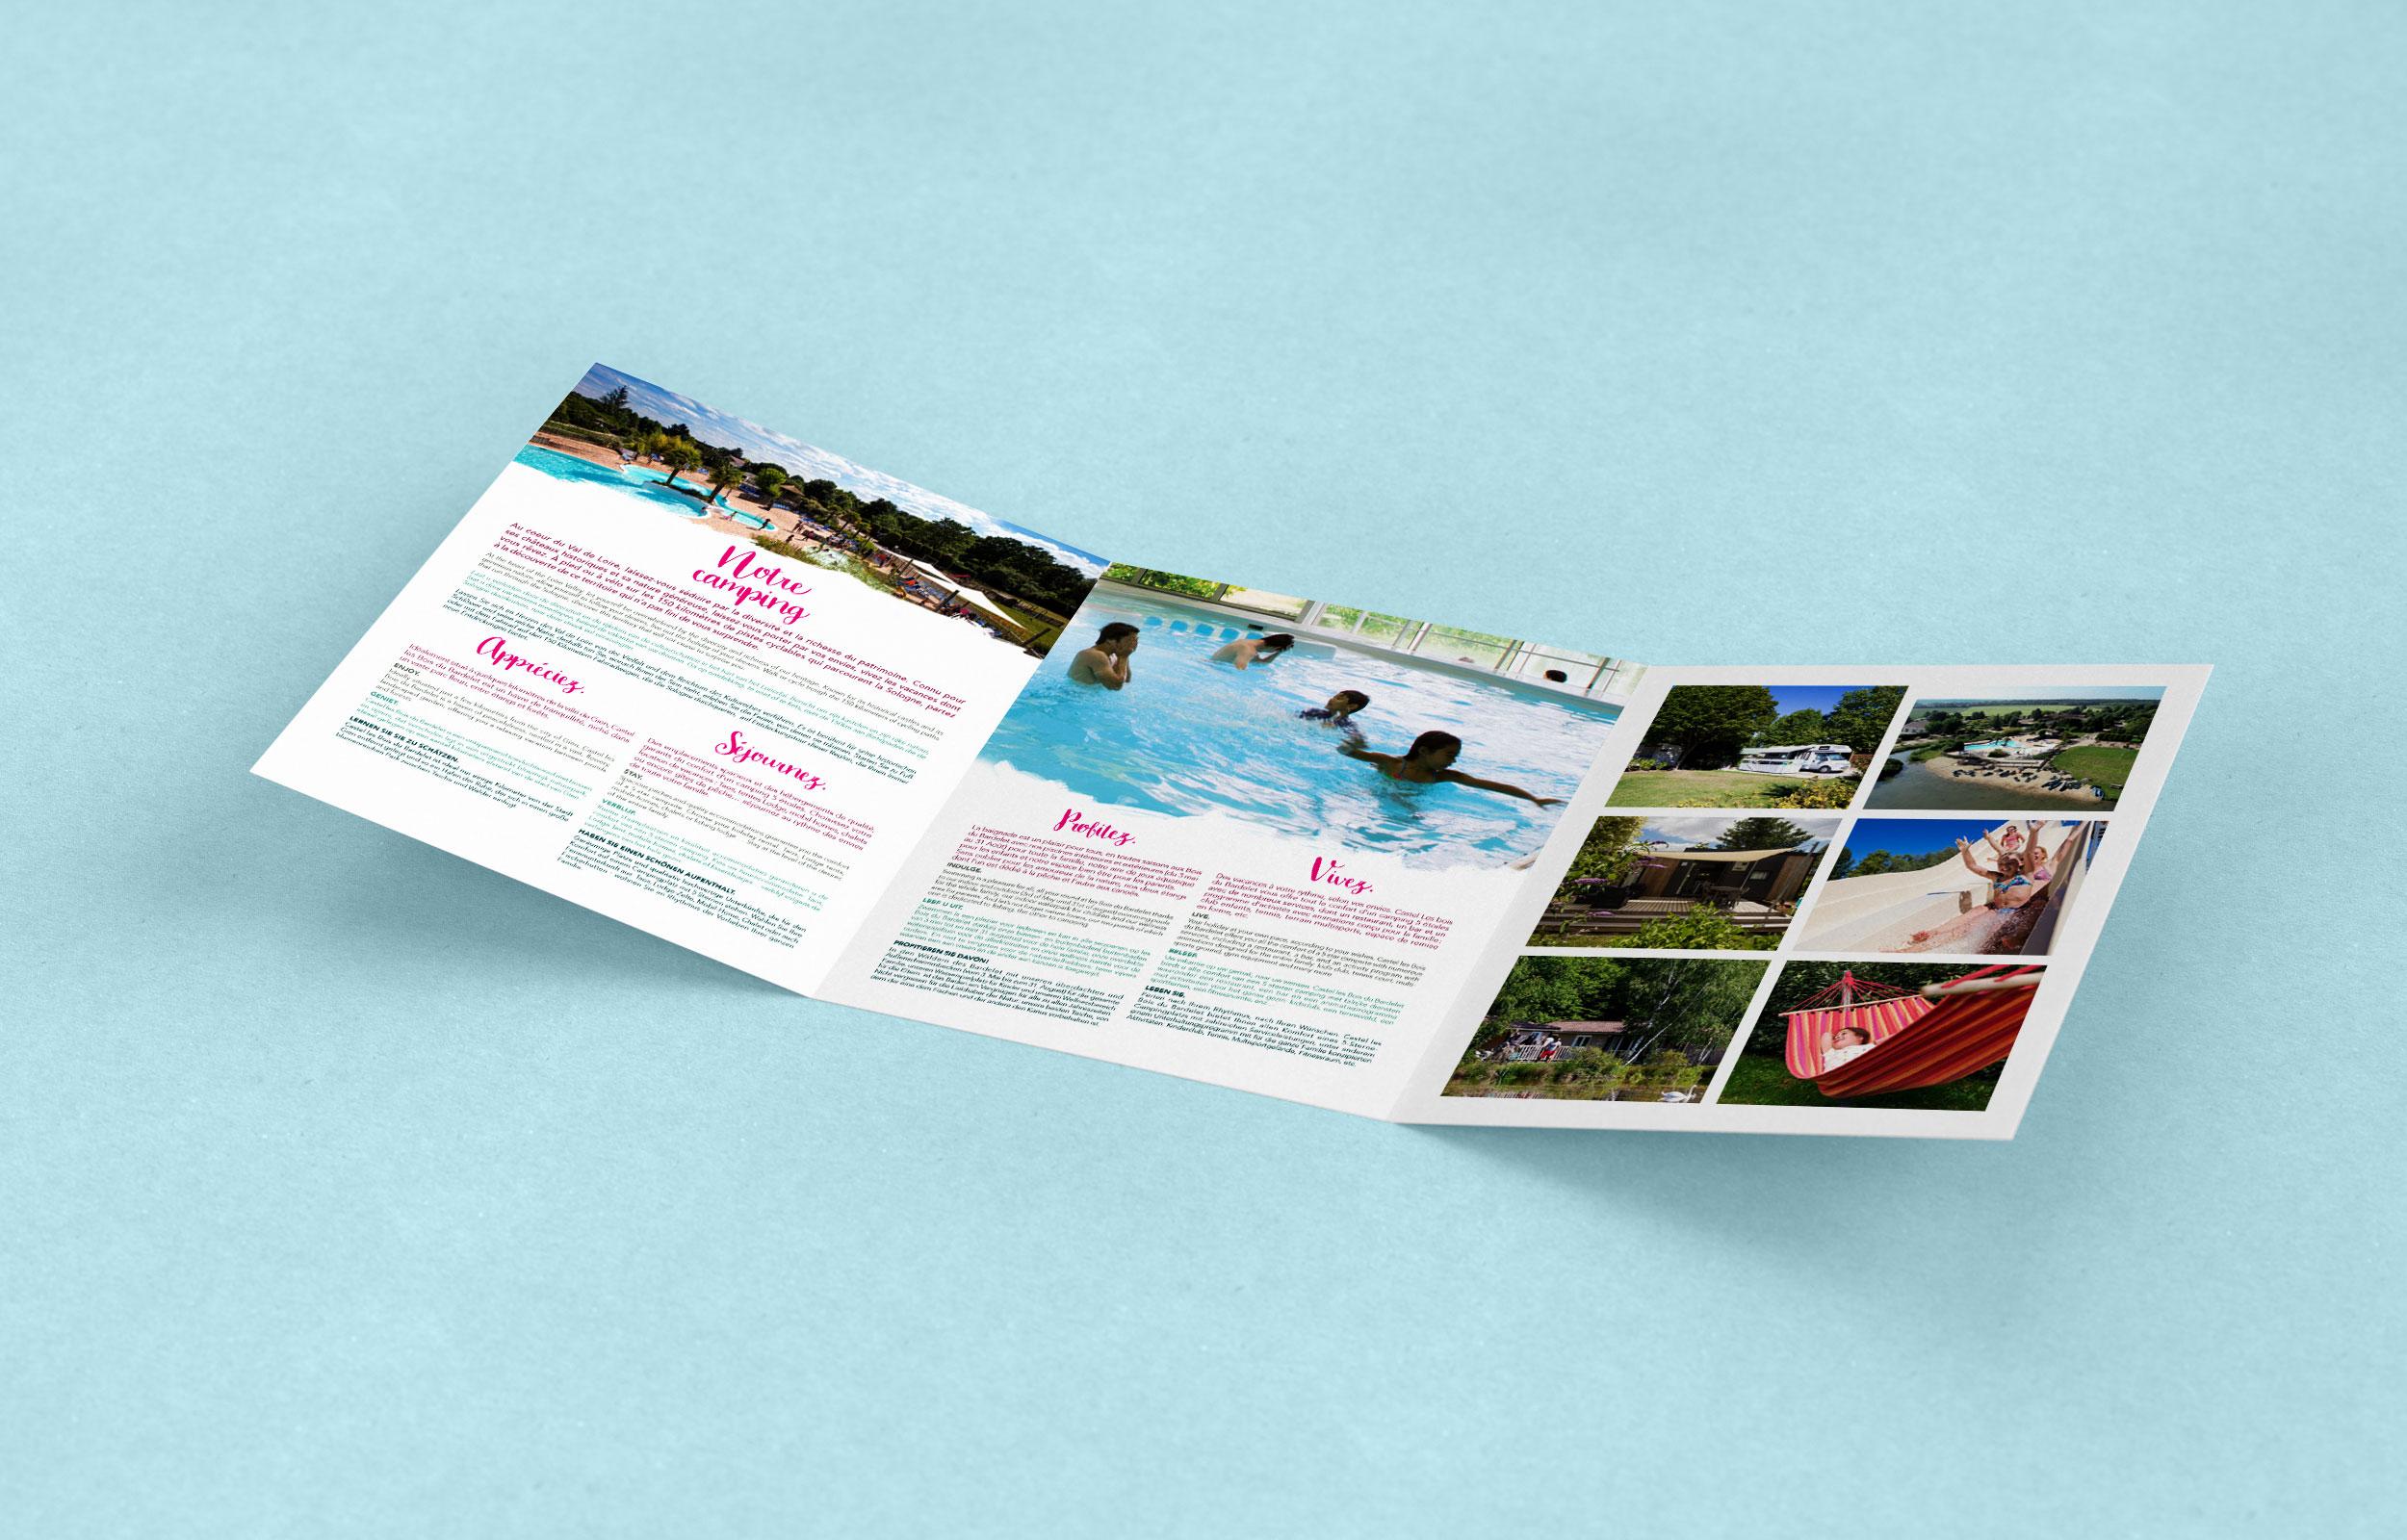 brochure mise en page par l'agence des monstres du bois du bardelet.